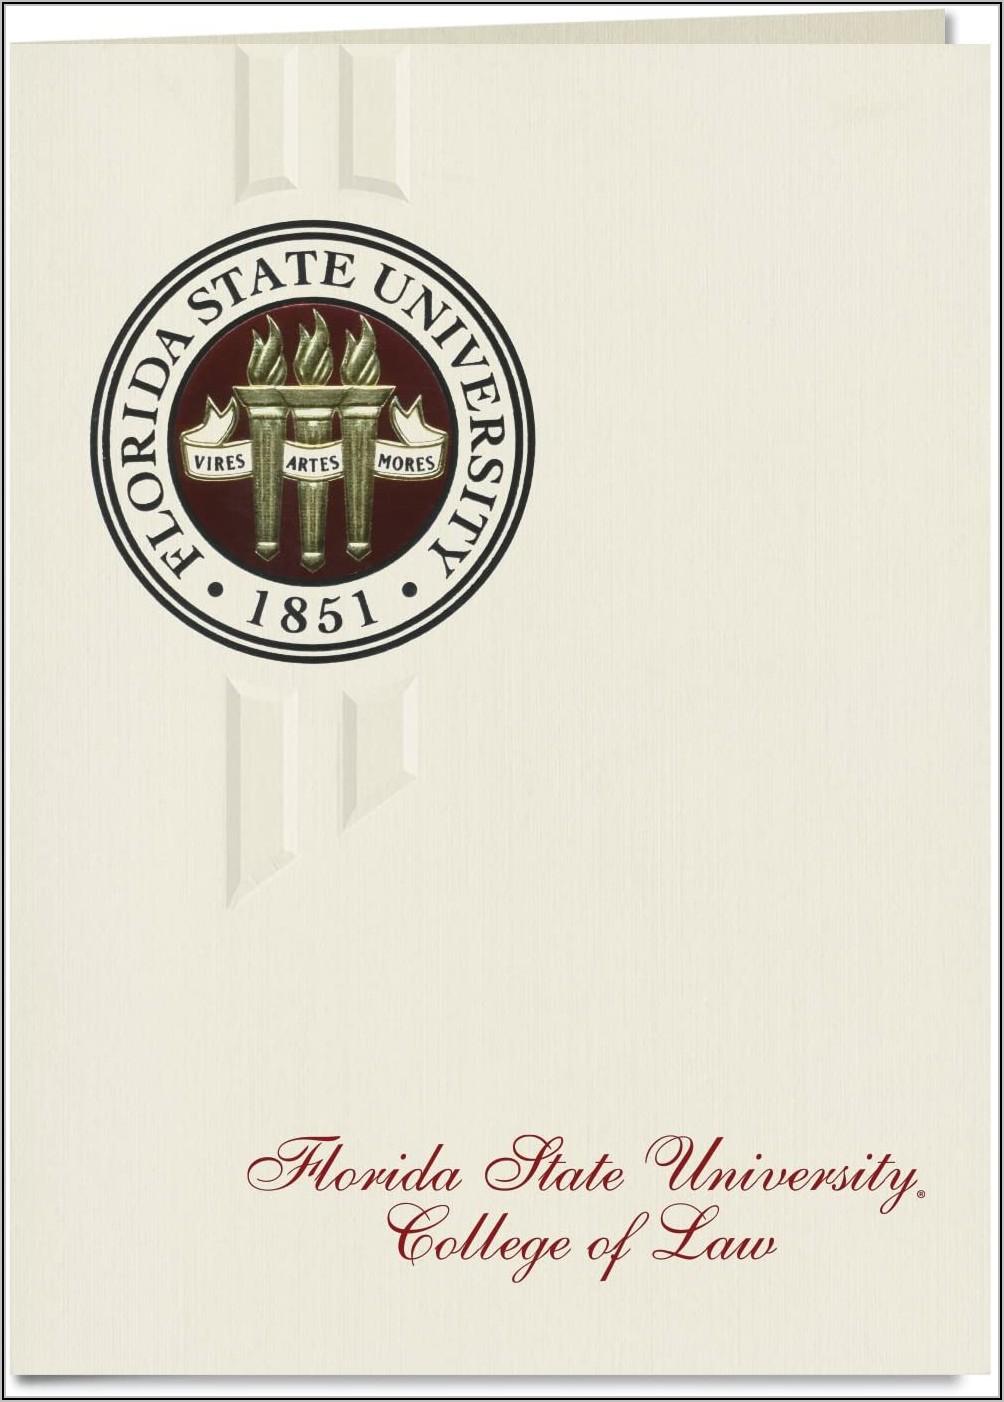 Florida State University Graduation Announcements